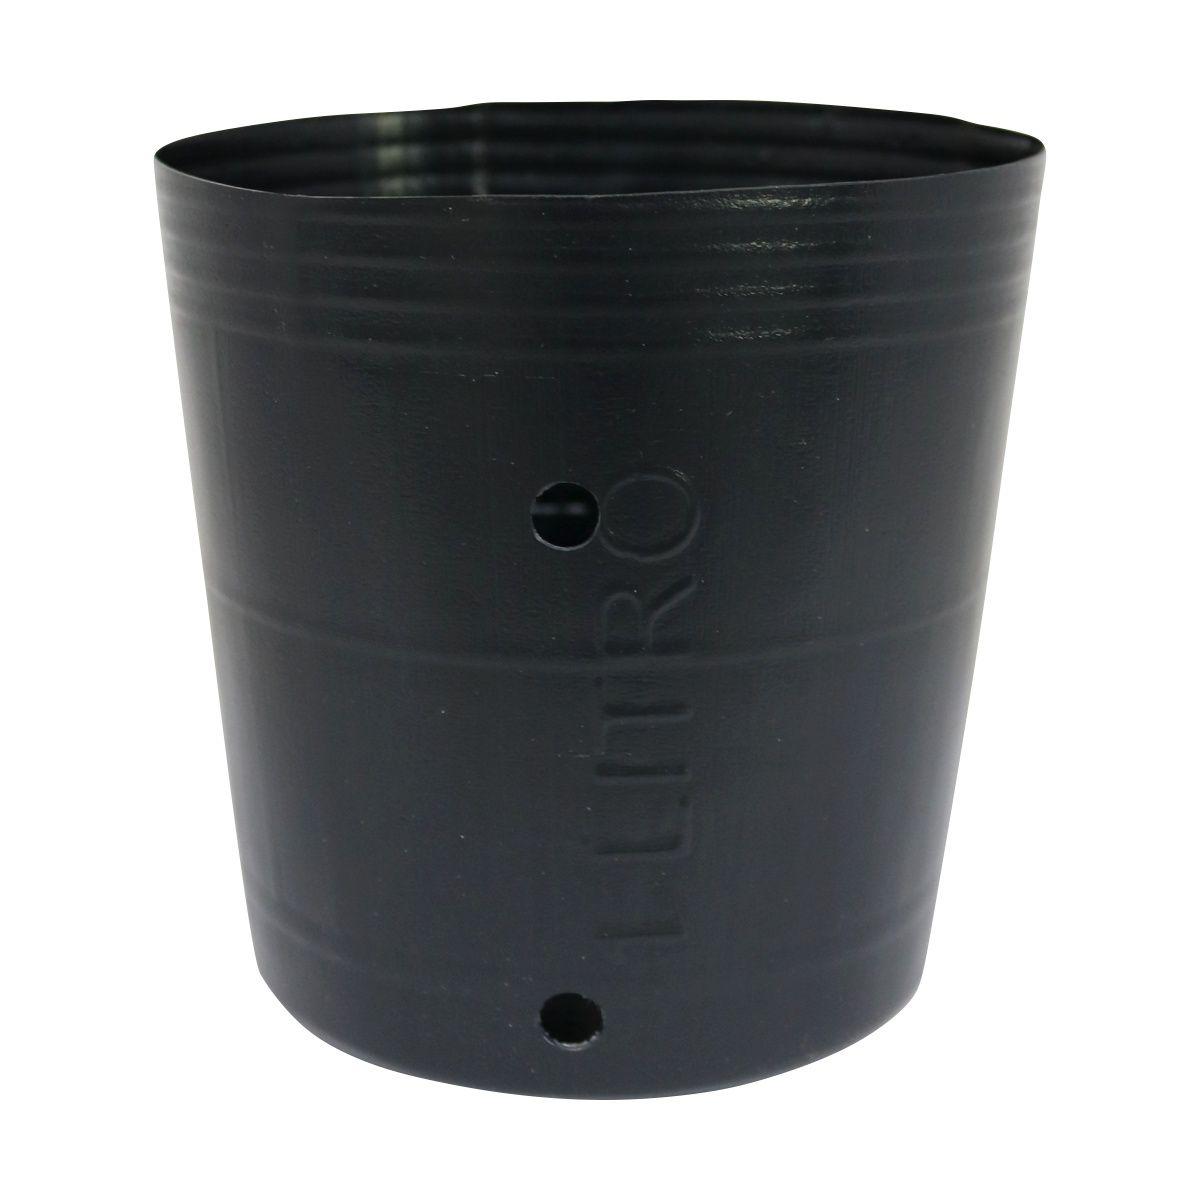 Vaso (embalagem) para mudas pote 1 litro